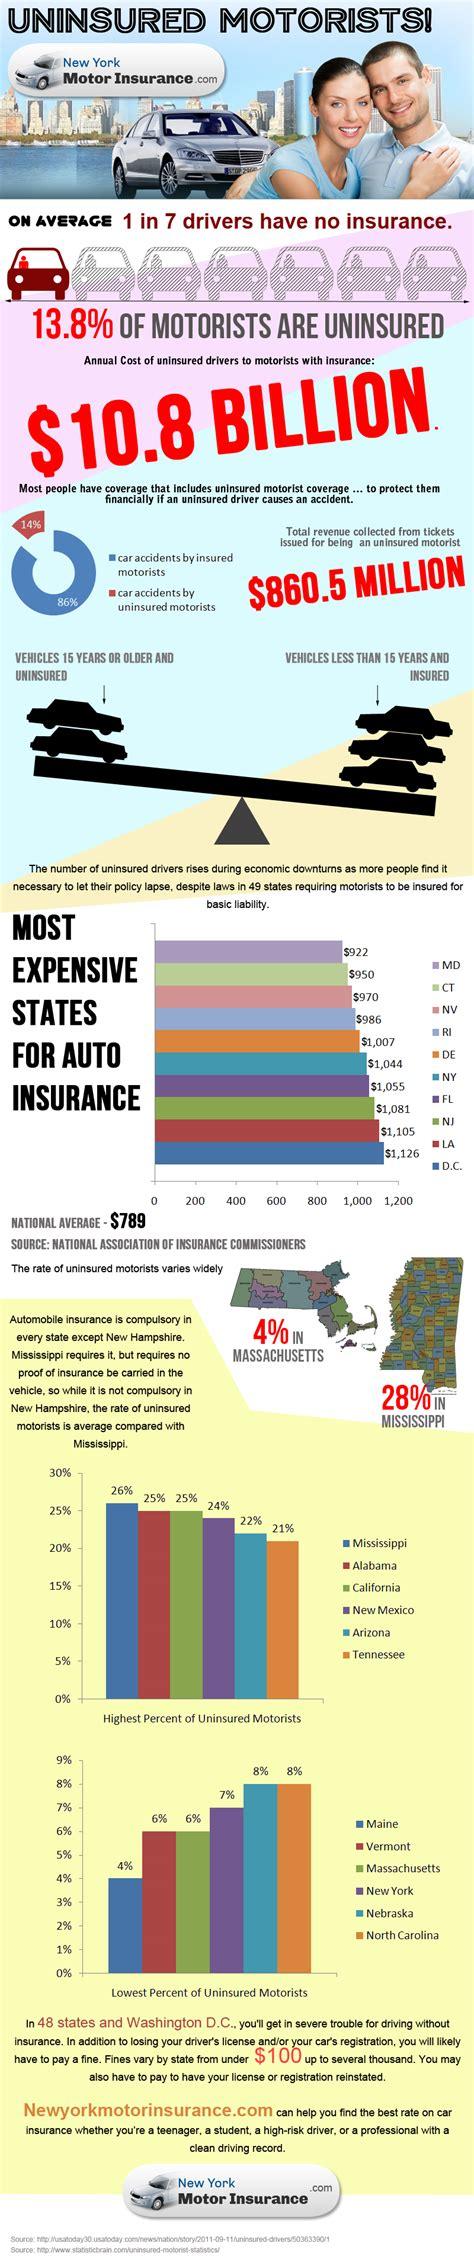 uninsured motors beware of uninsured motorists a look at the uninsured